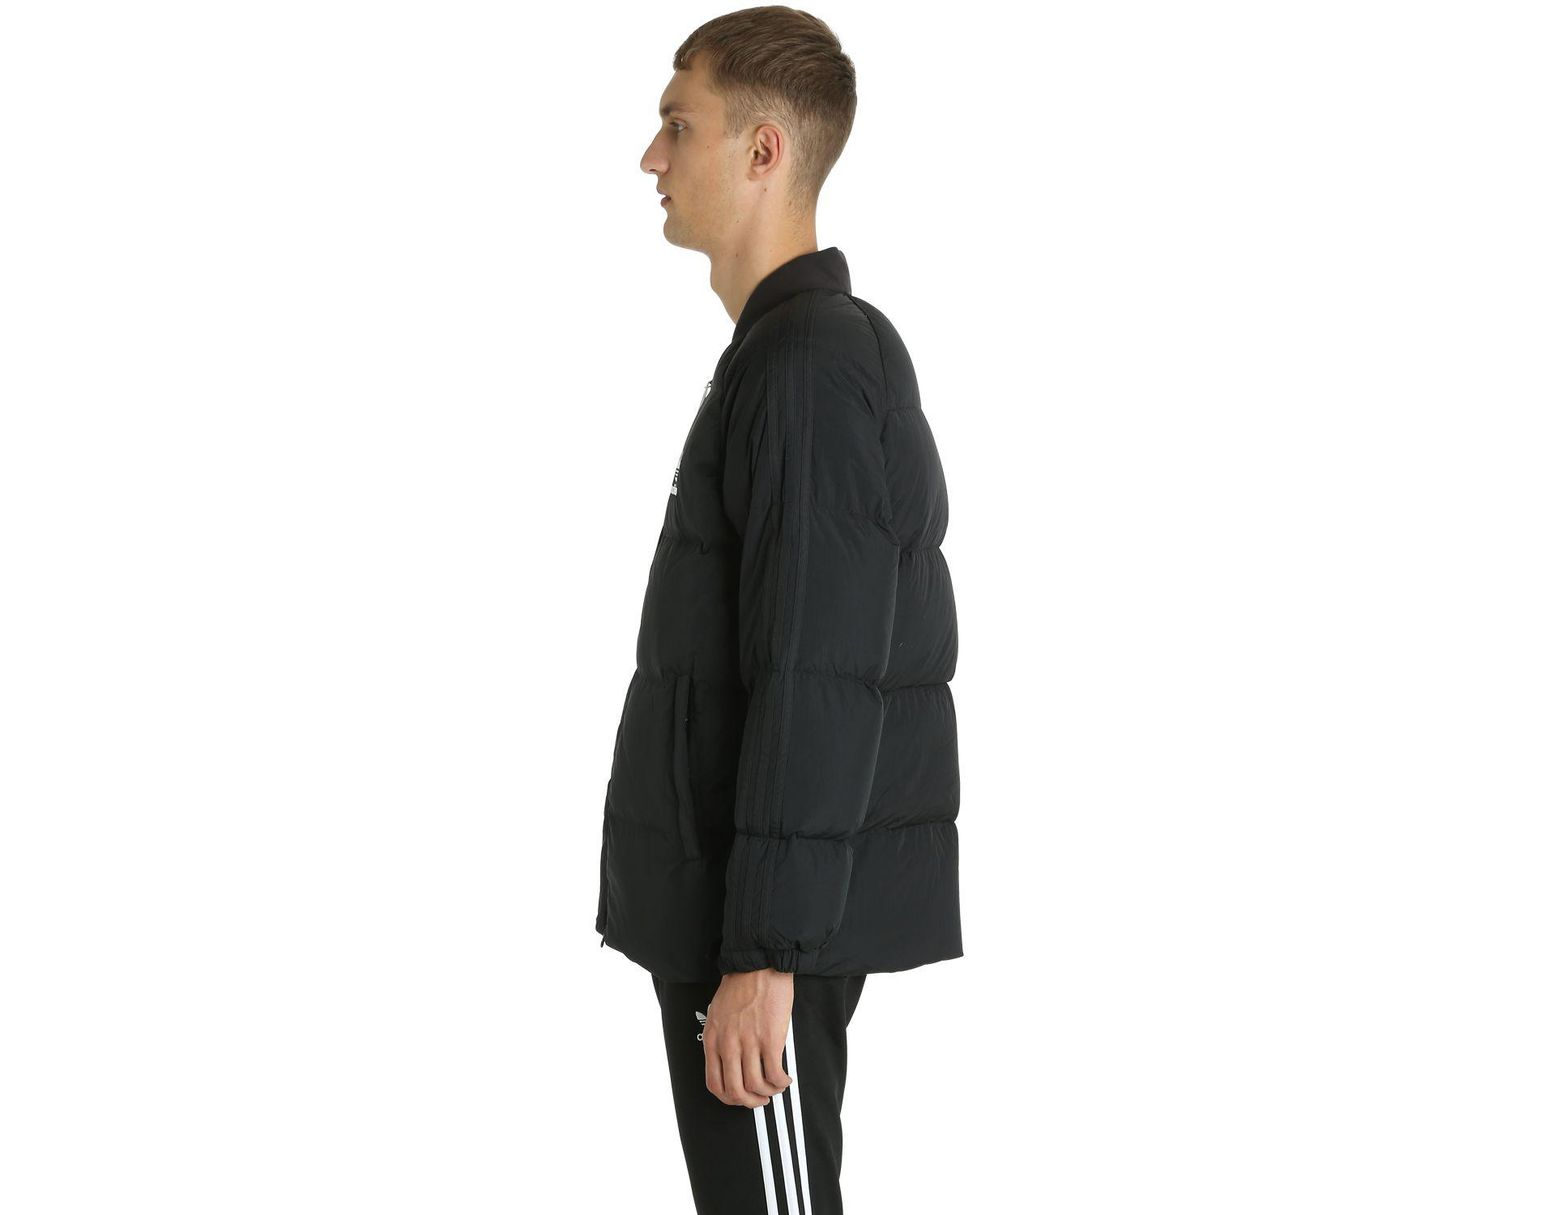 66c86acd9 Lyst - adidas Originals Sst Logo Padded Bomber Jacket in Black for Men